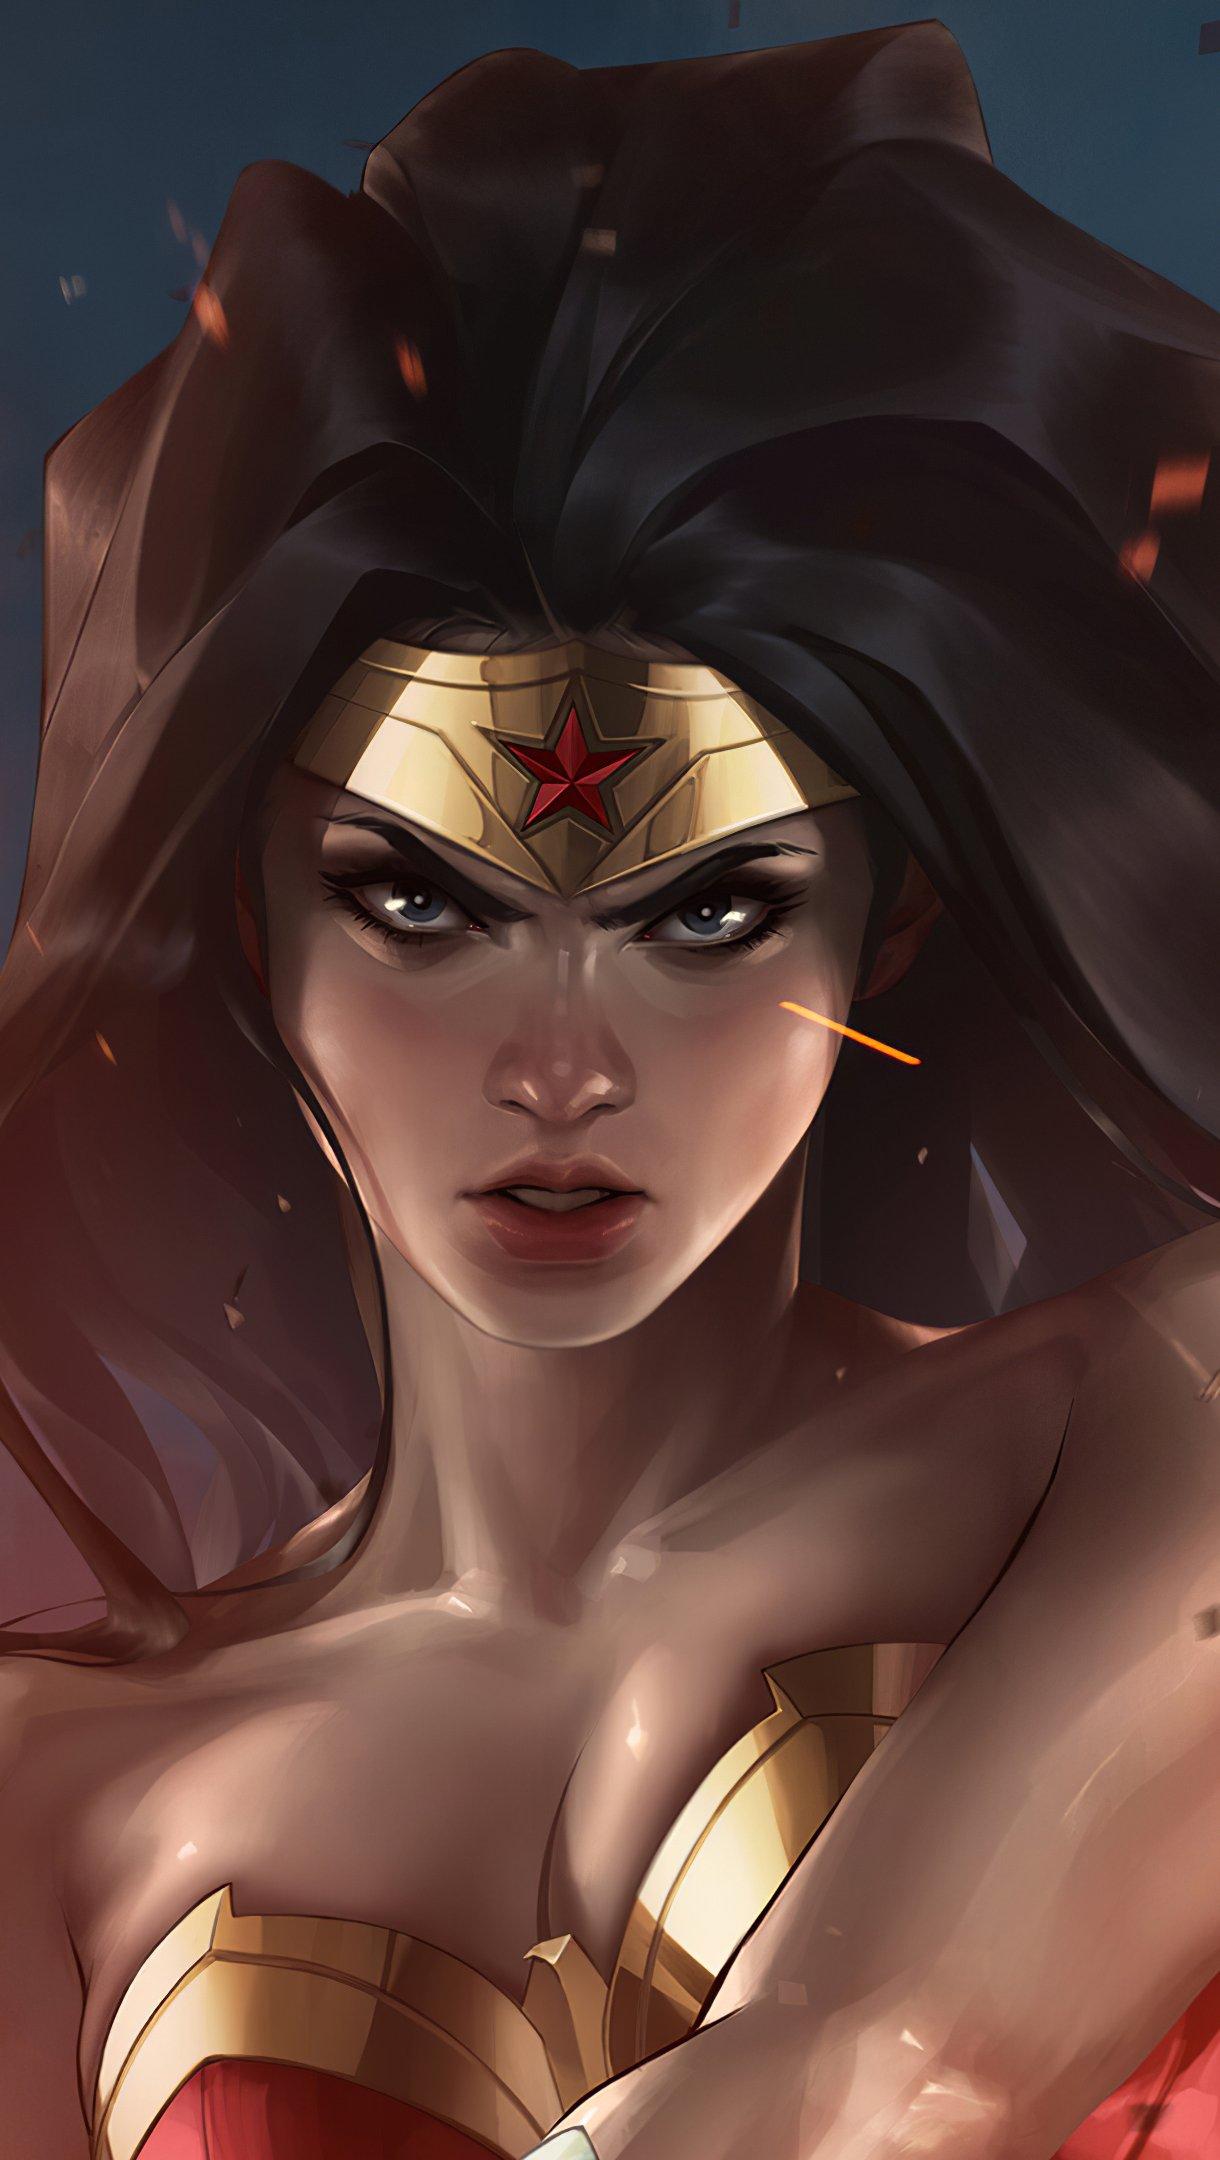 Wallpaper Wonder Woman Illustration Vertical